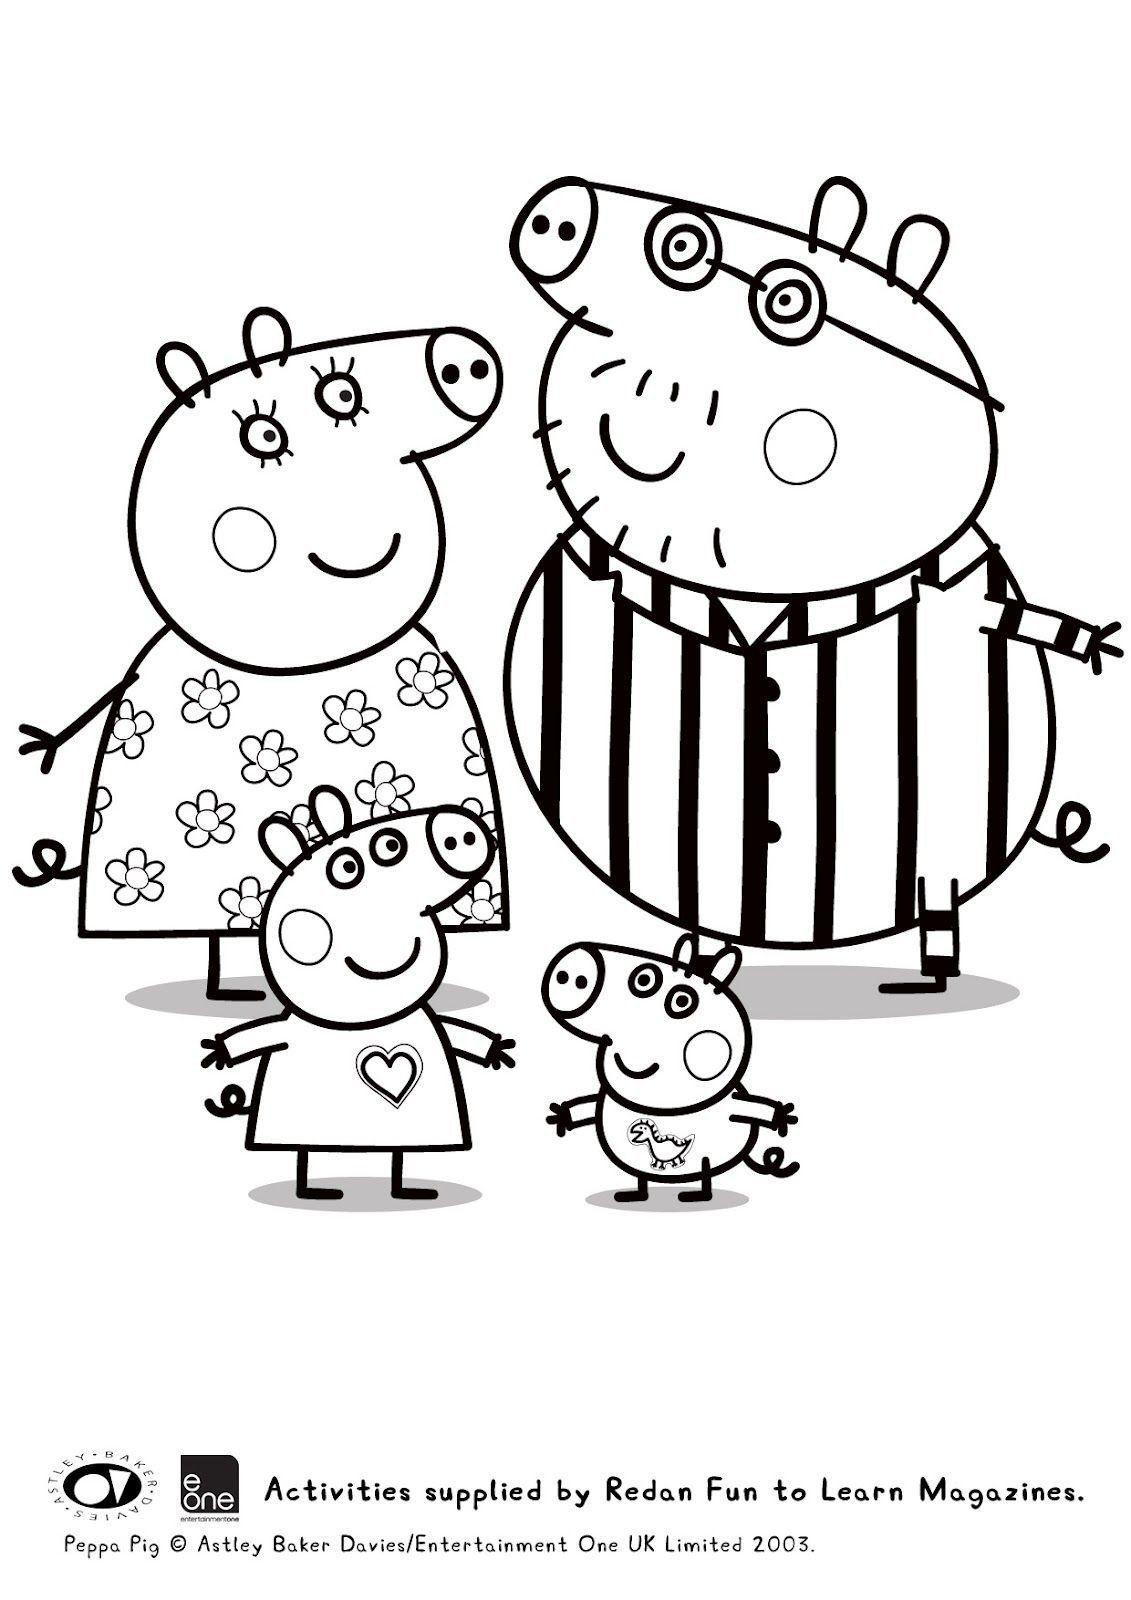 peppa pig ausmalbilder gratis  kinder ausmalbilder